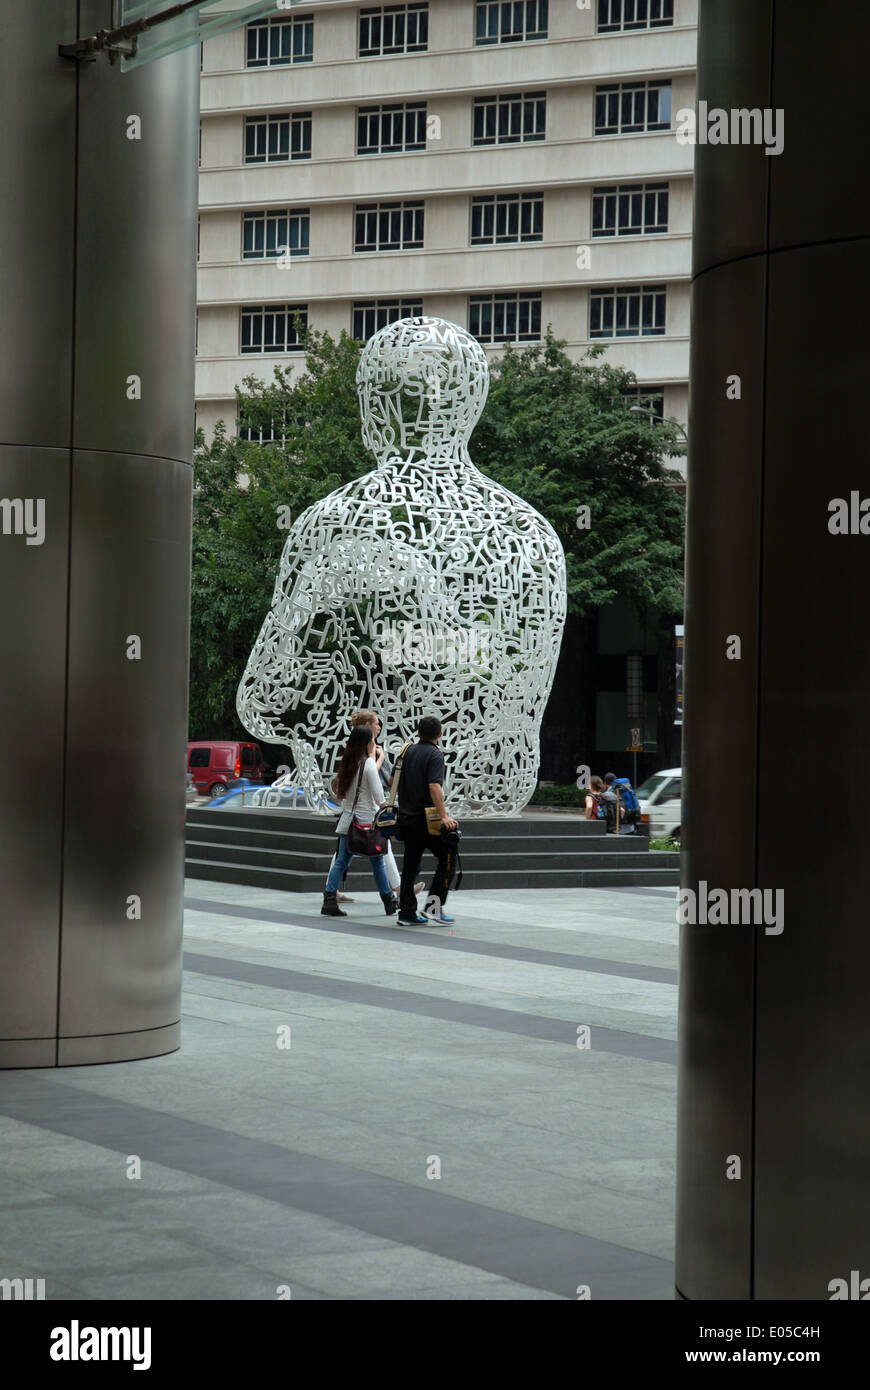 Singapore soul sculpture by catalan artist jaume plensa for Artiste peintre catalan